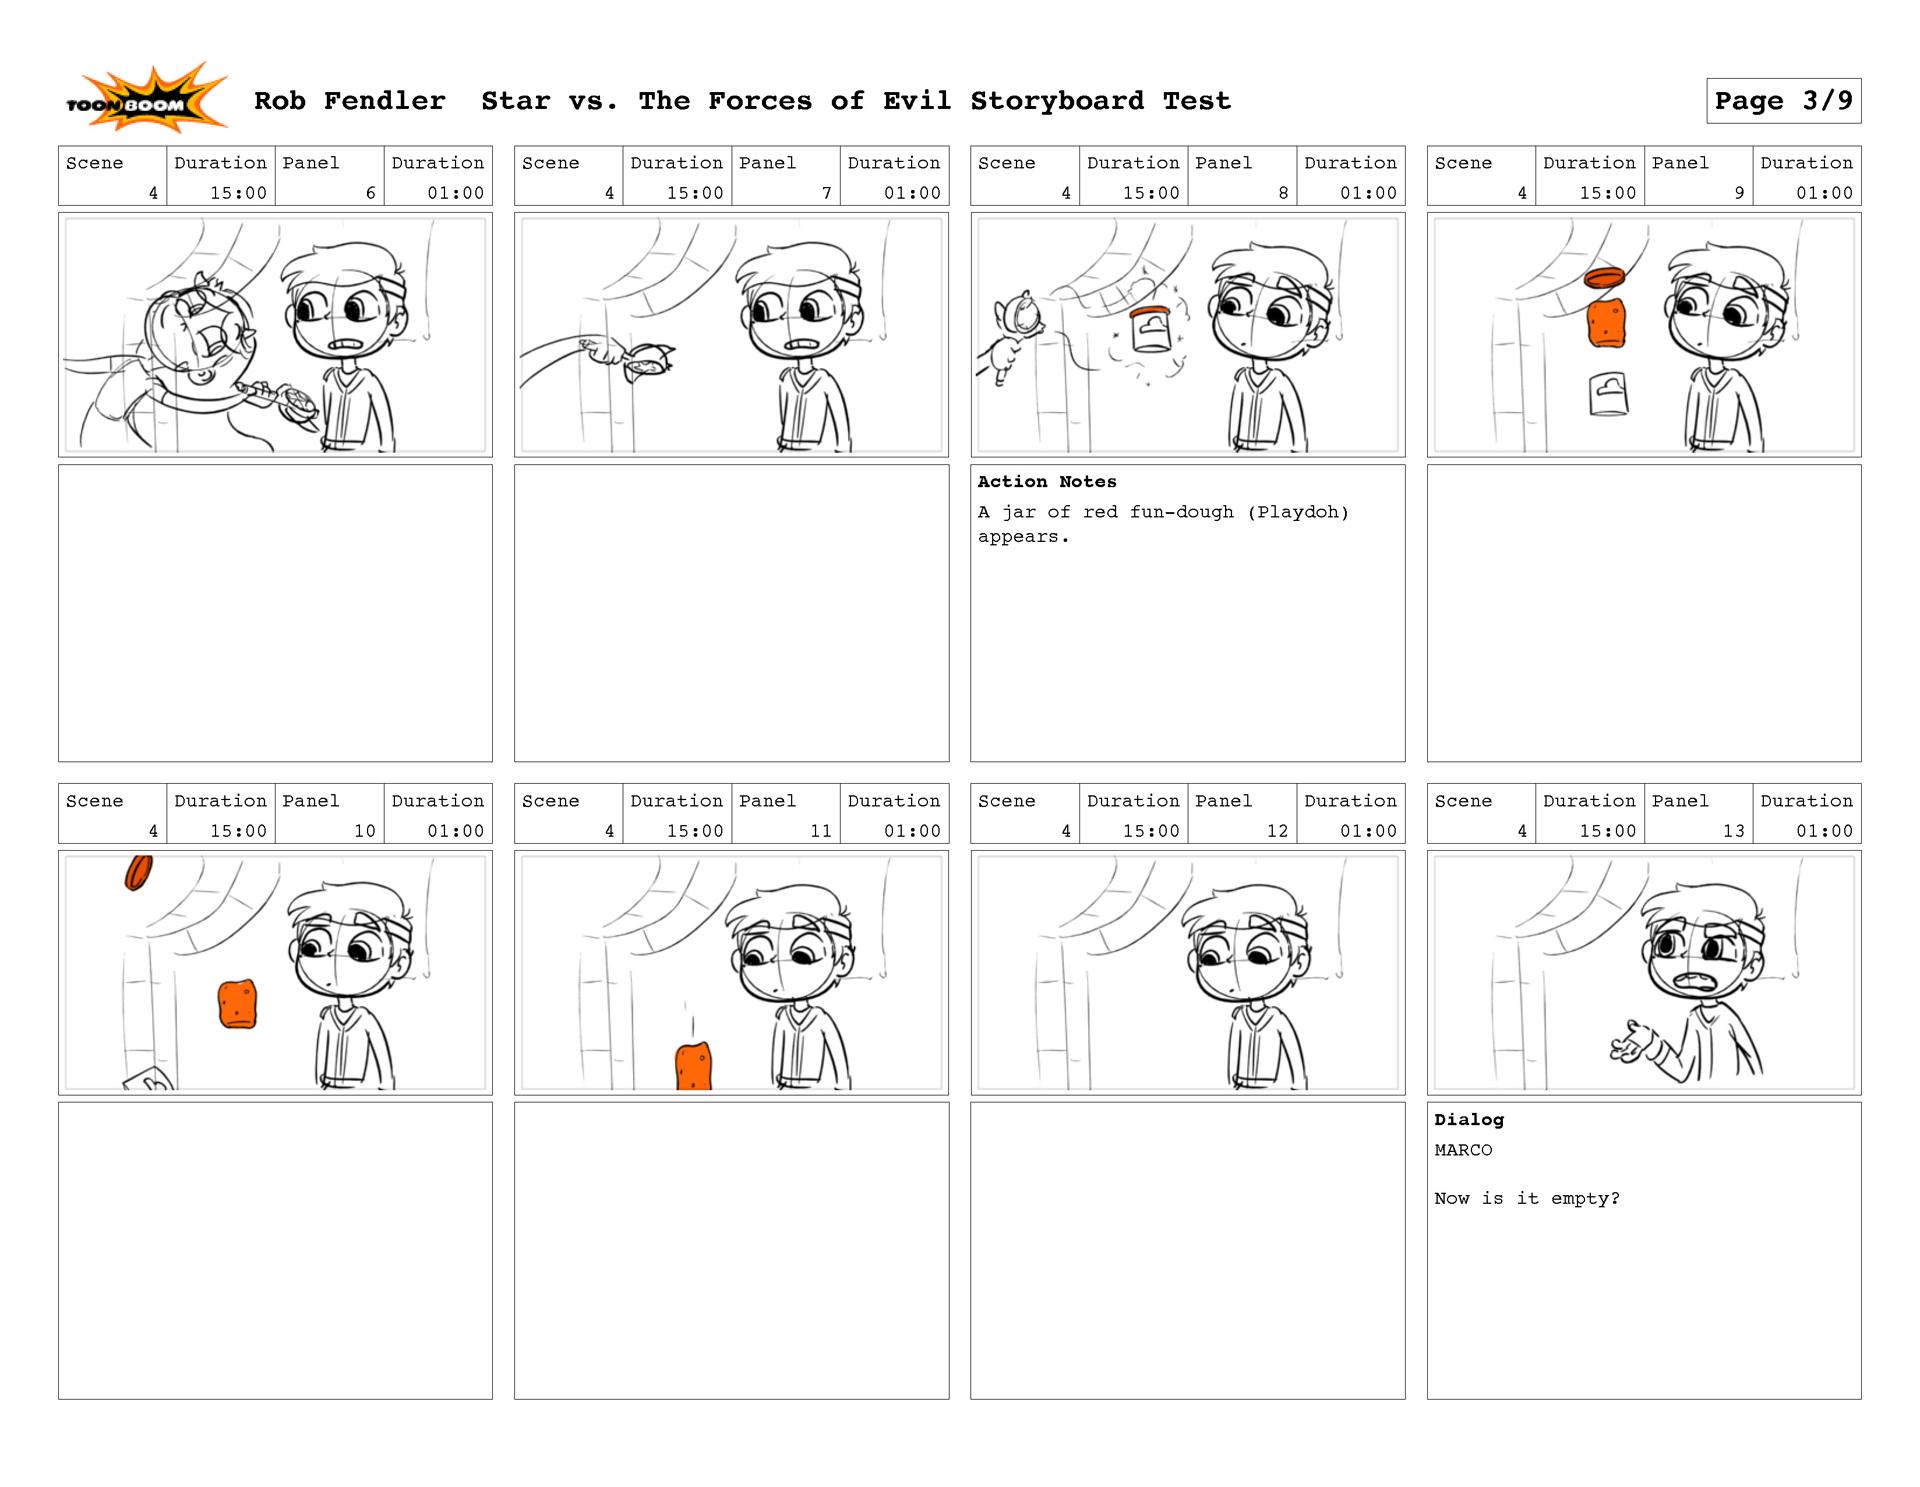 StarVs_Storyboardtest_Page_3_1920